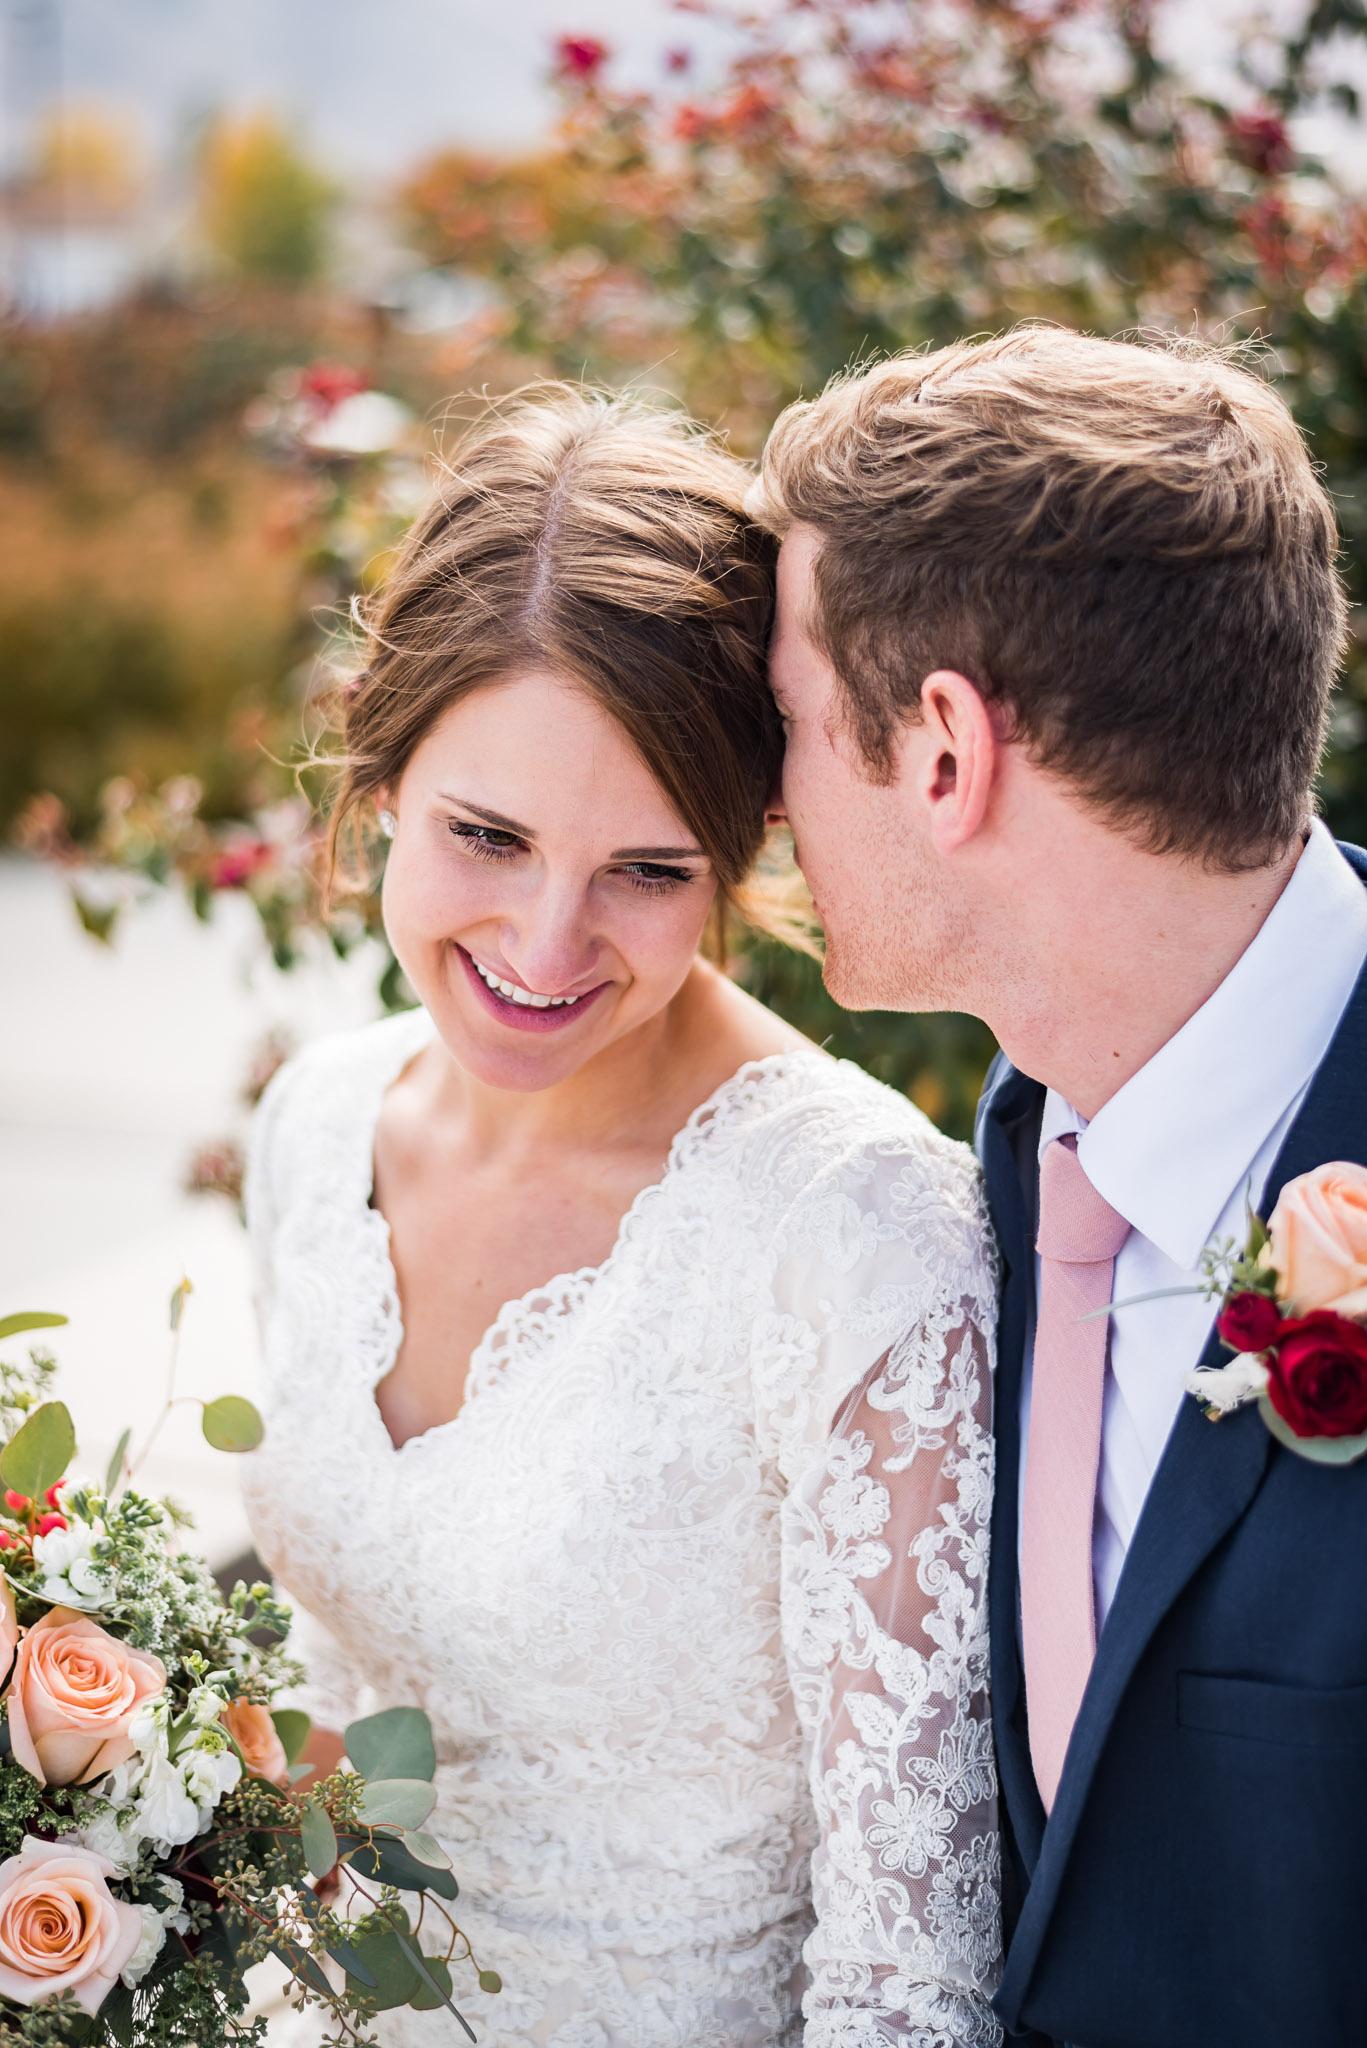 Taylor Wedding Low resolution-330.jpg